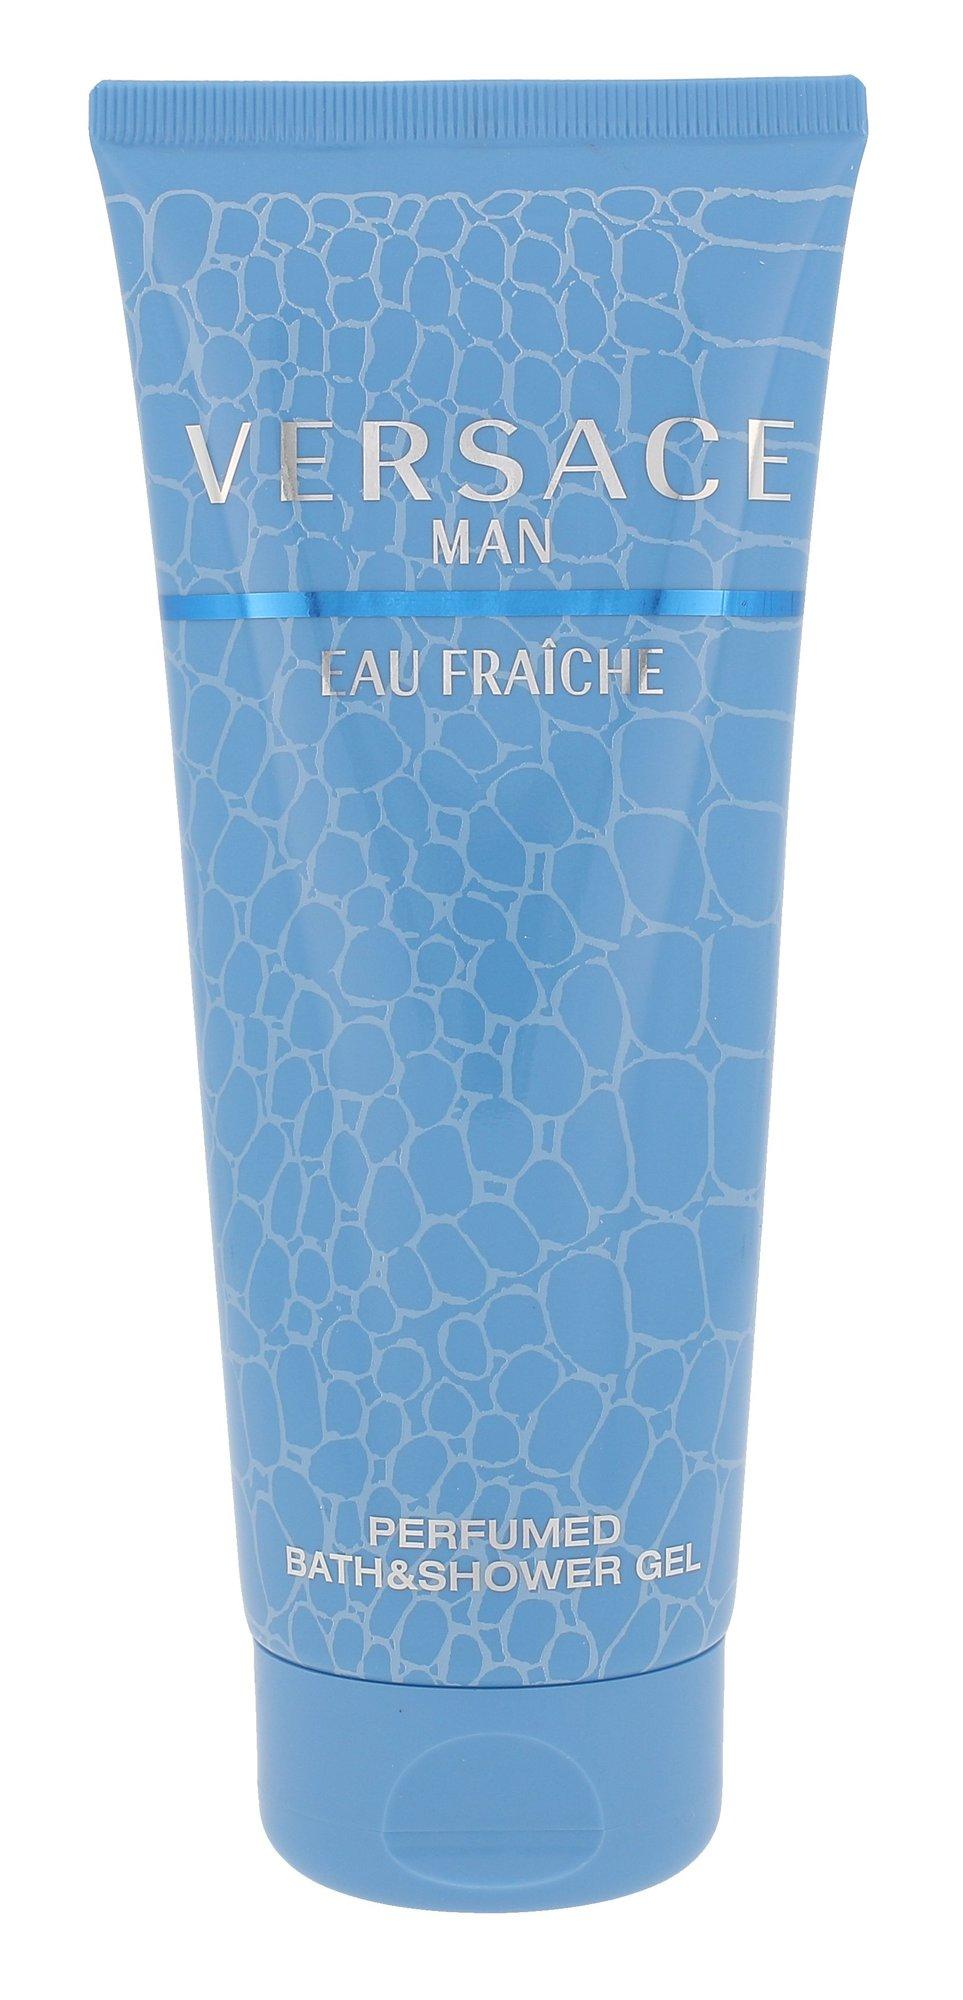 Versace Man Eau Fraiche Shower gel 200ml